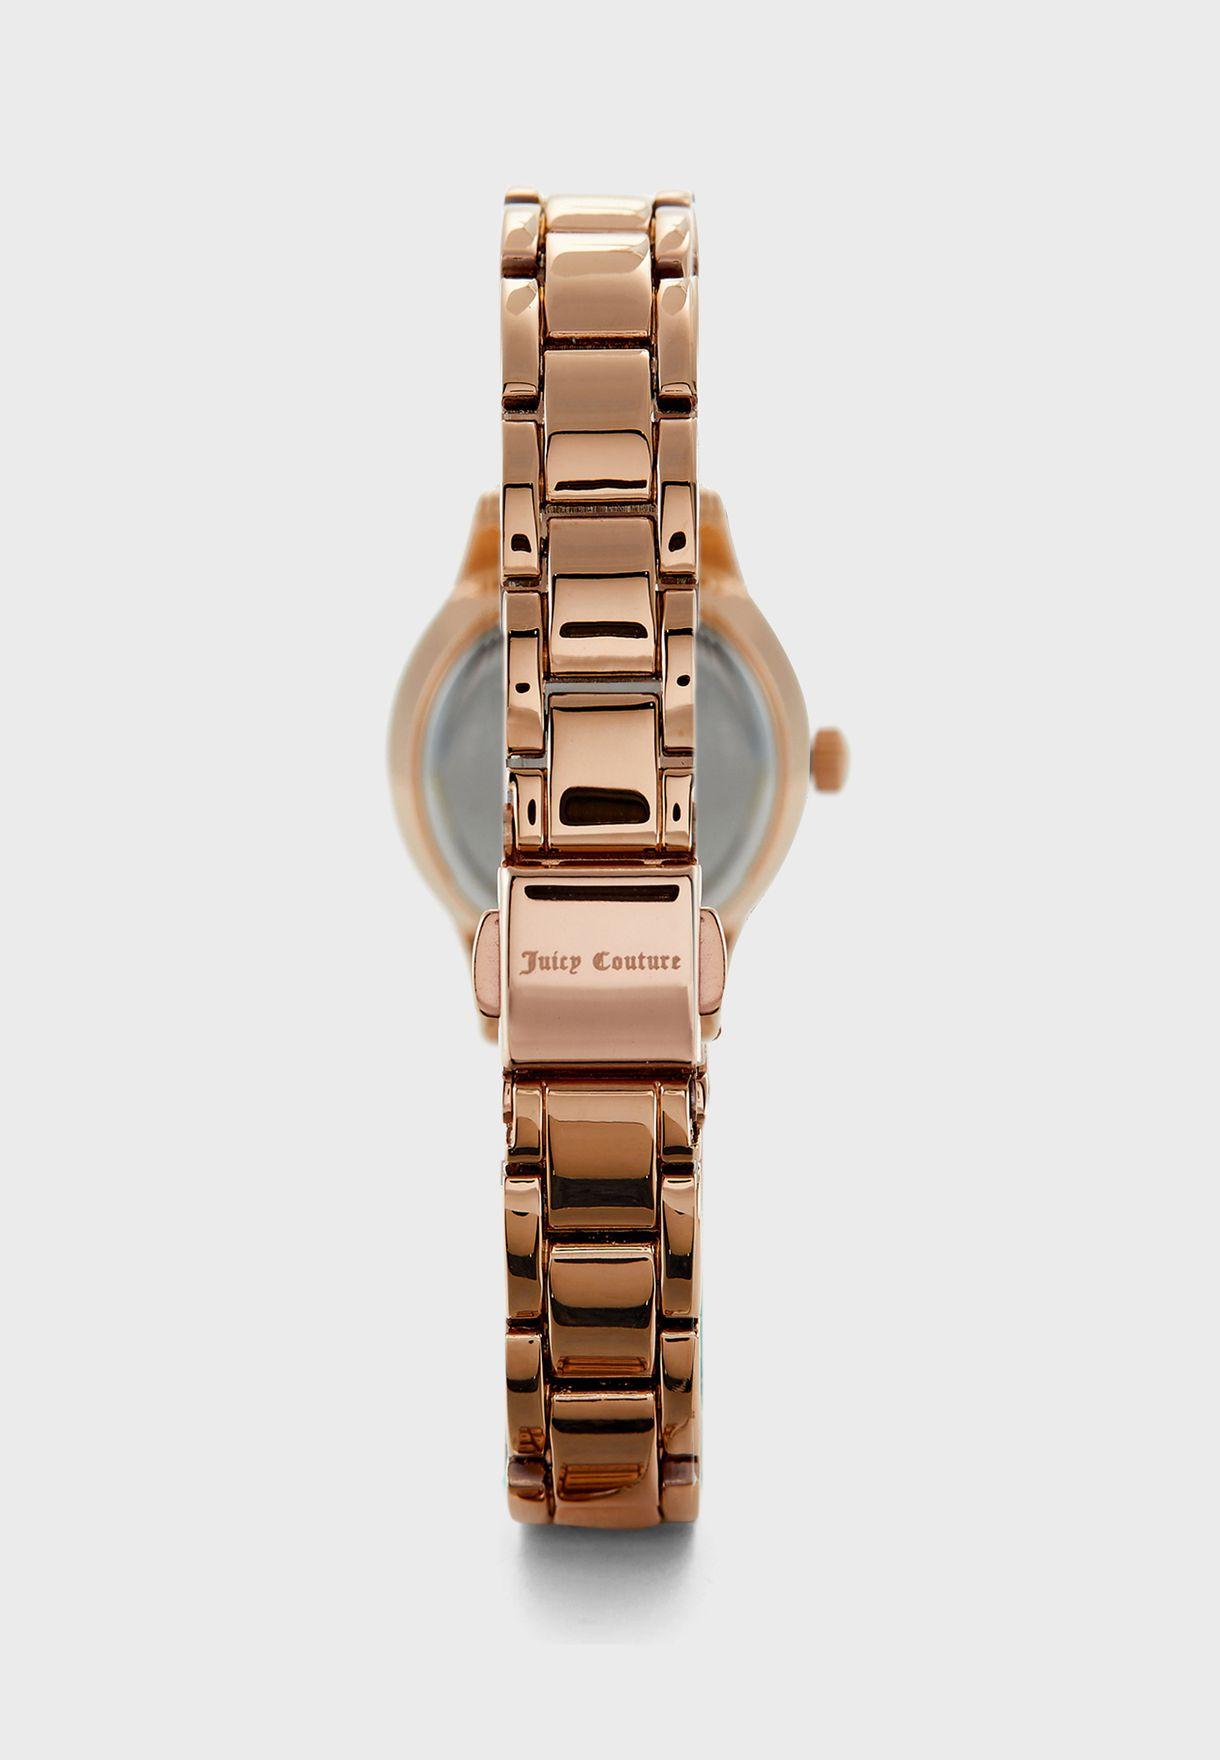 Steel Strap Analog Watch+Charm Bracelet Set